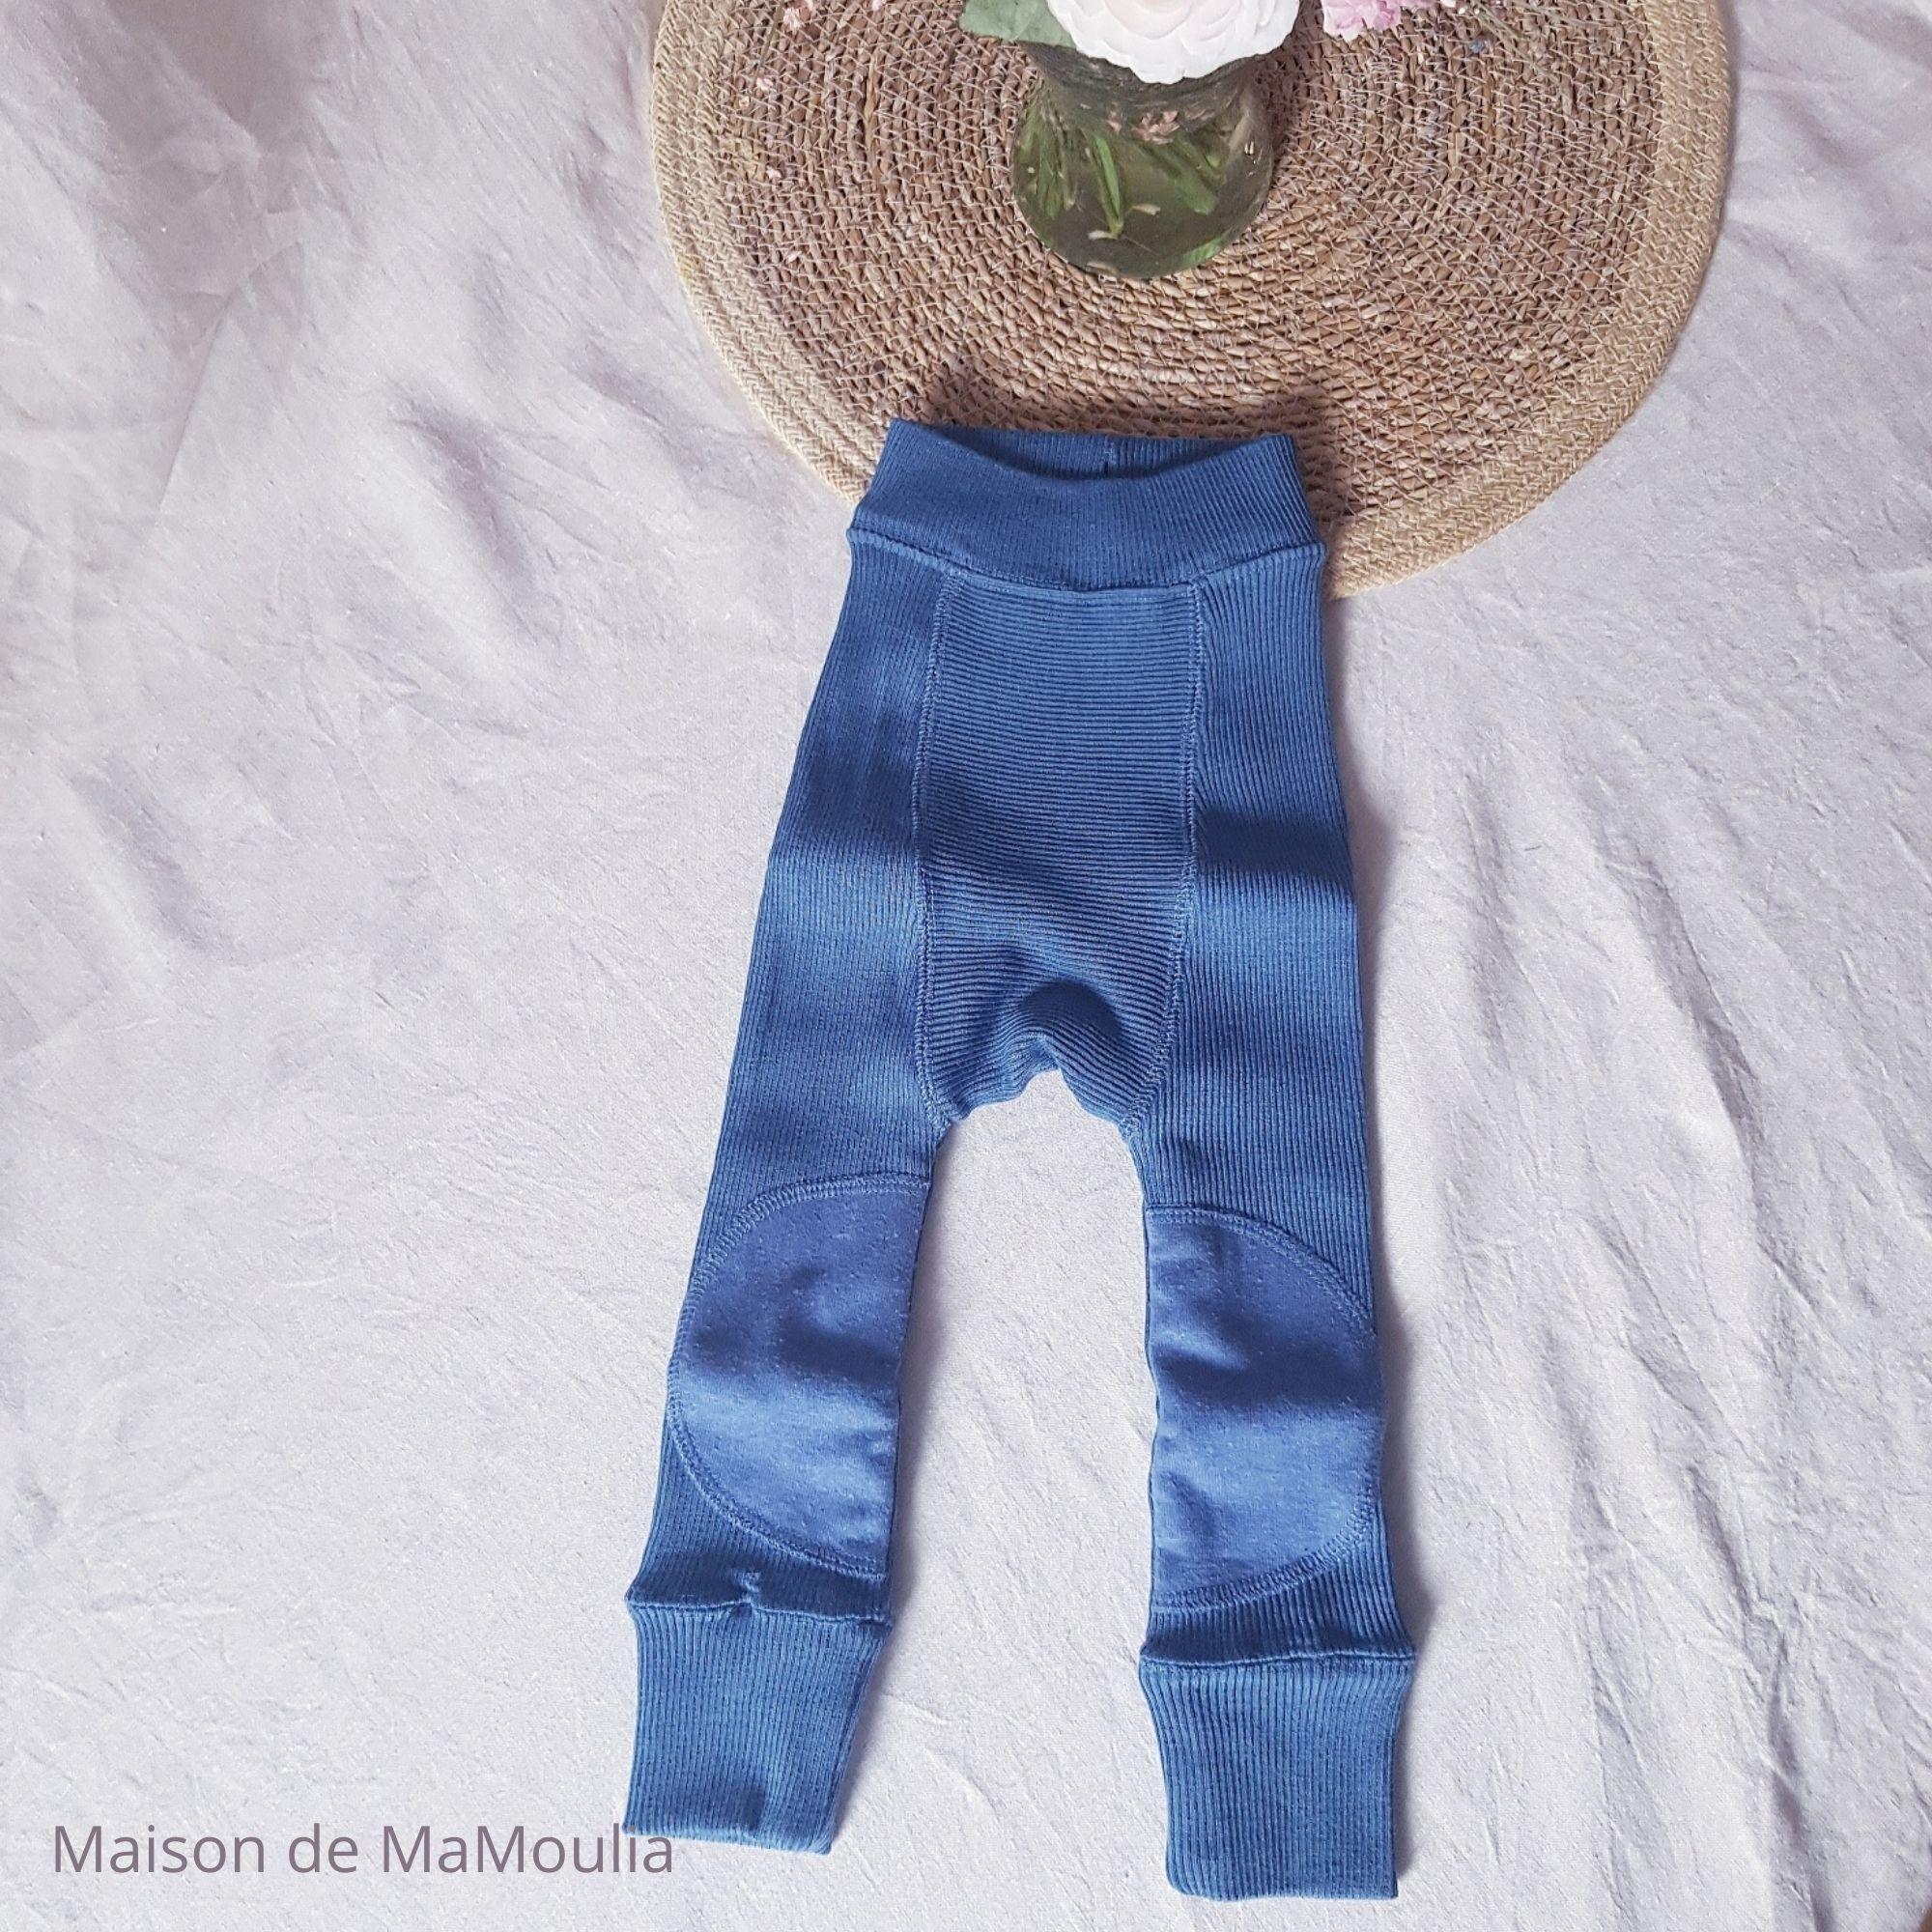 MANYMONTHS - LONGIES évolutif avec genouillères - 100% laine mérinos - COSMOS